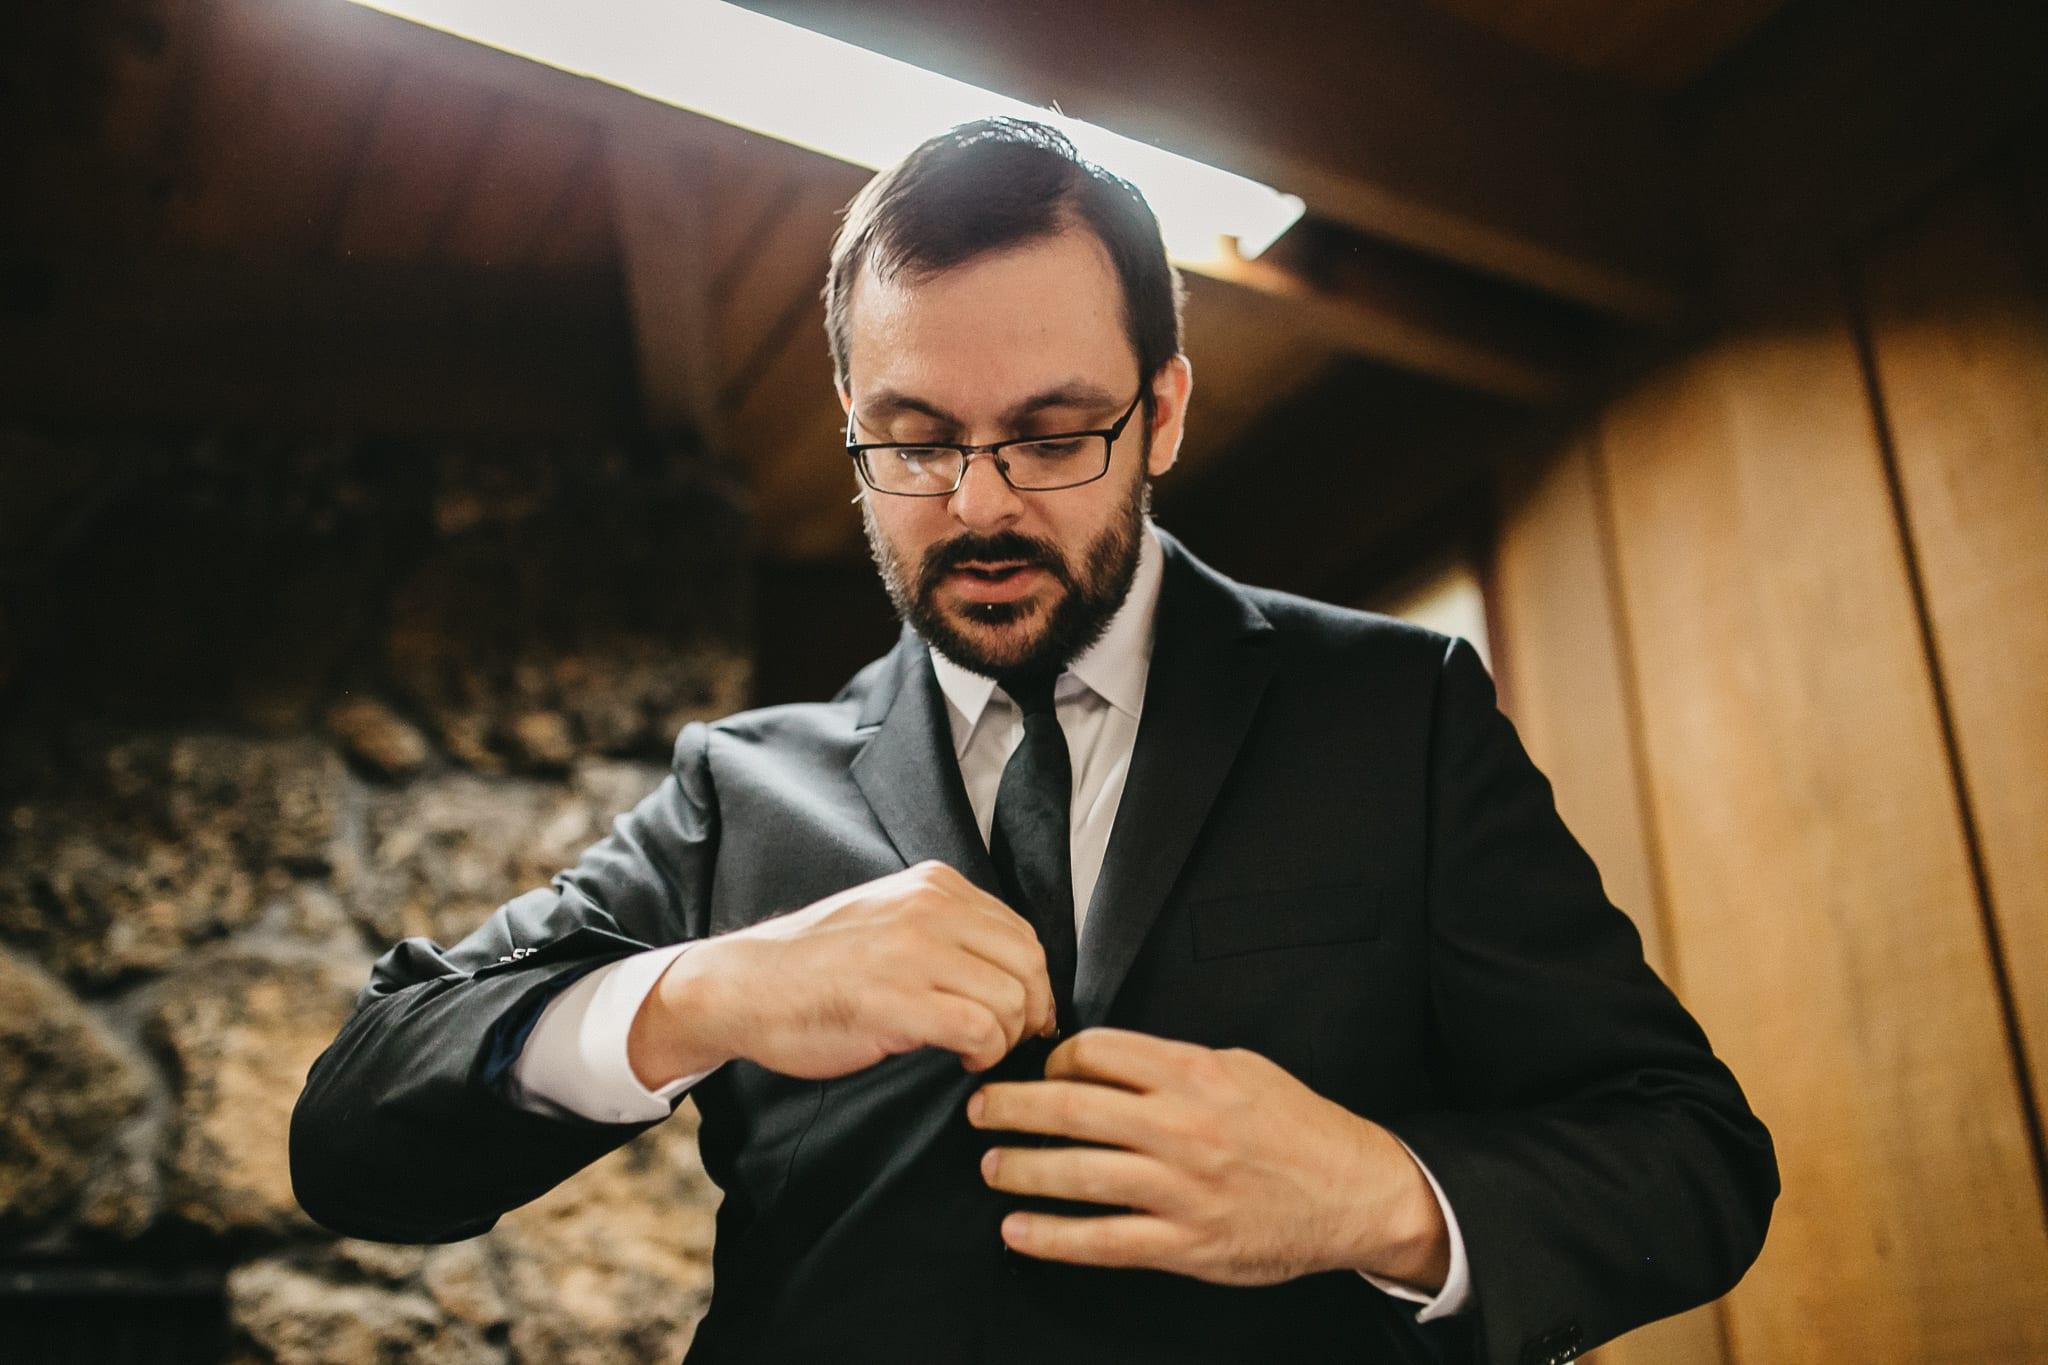 chico-card-center-wedding-photographer-13